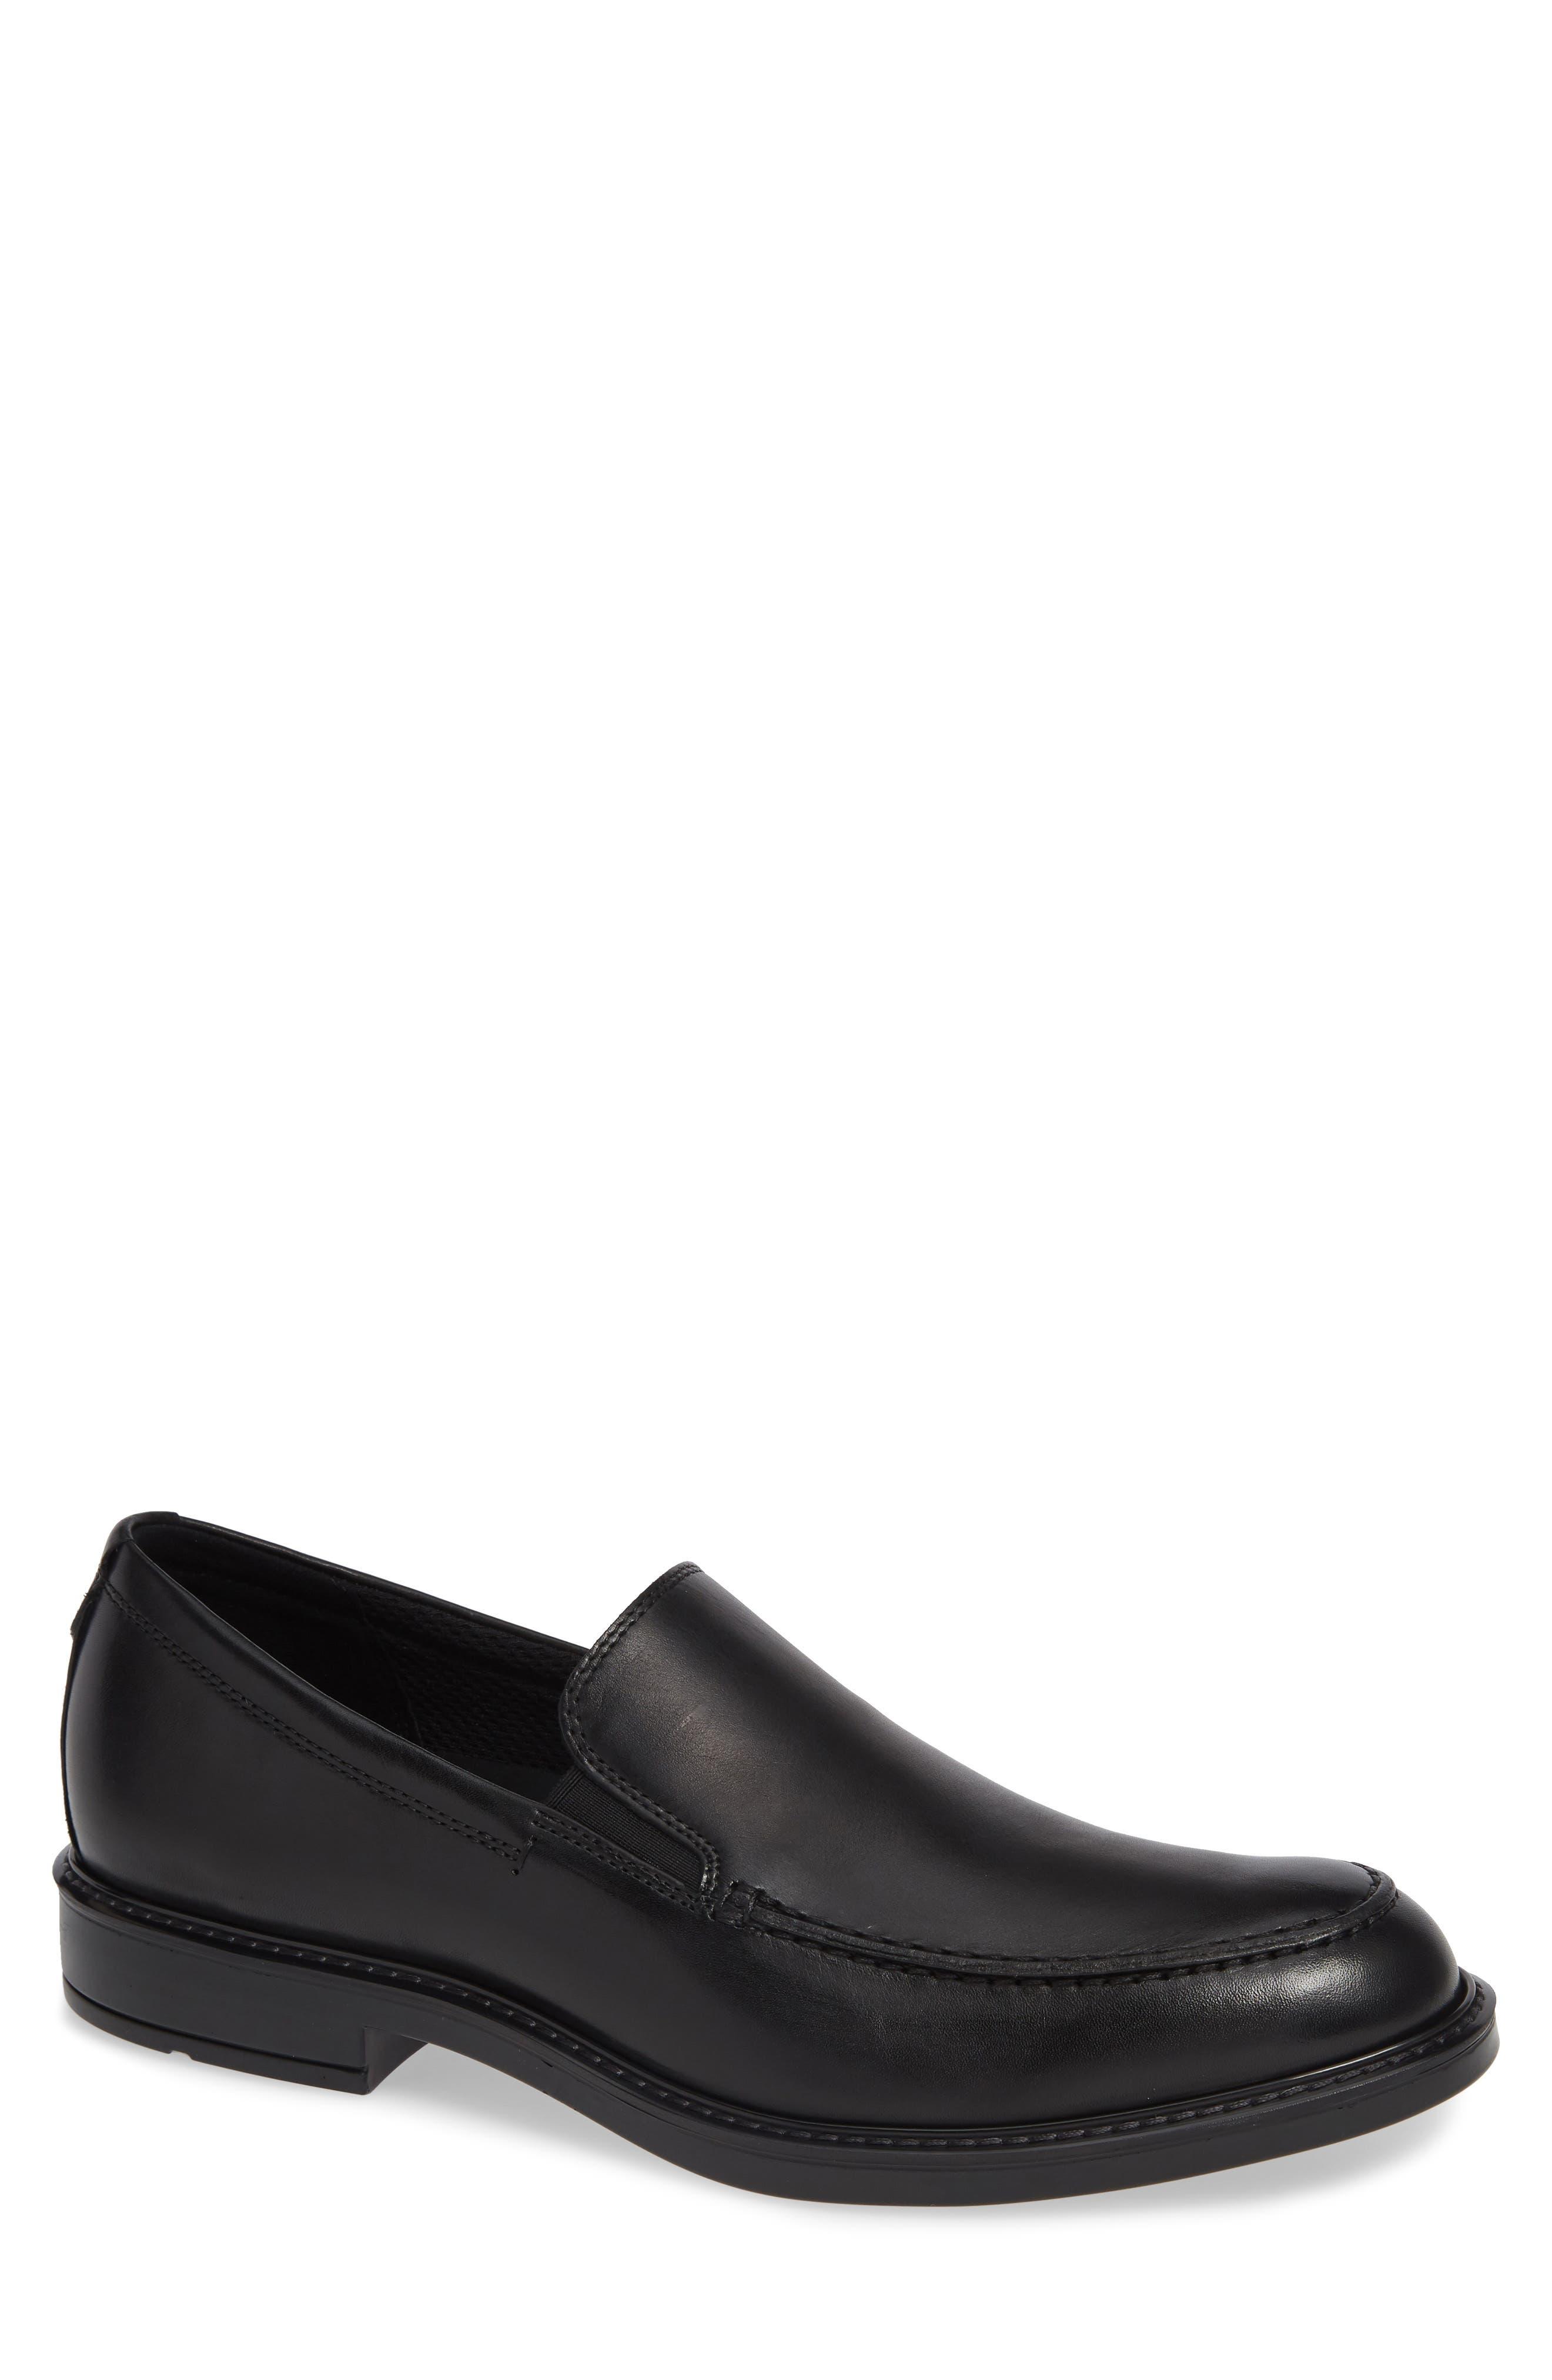 ECCO Vitrus<sup>™</sup> III Moc Toe Loafer, Main, color, BLACK LEATHER